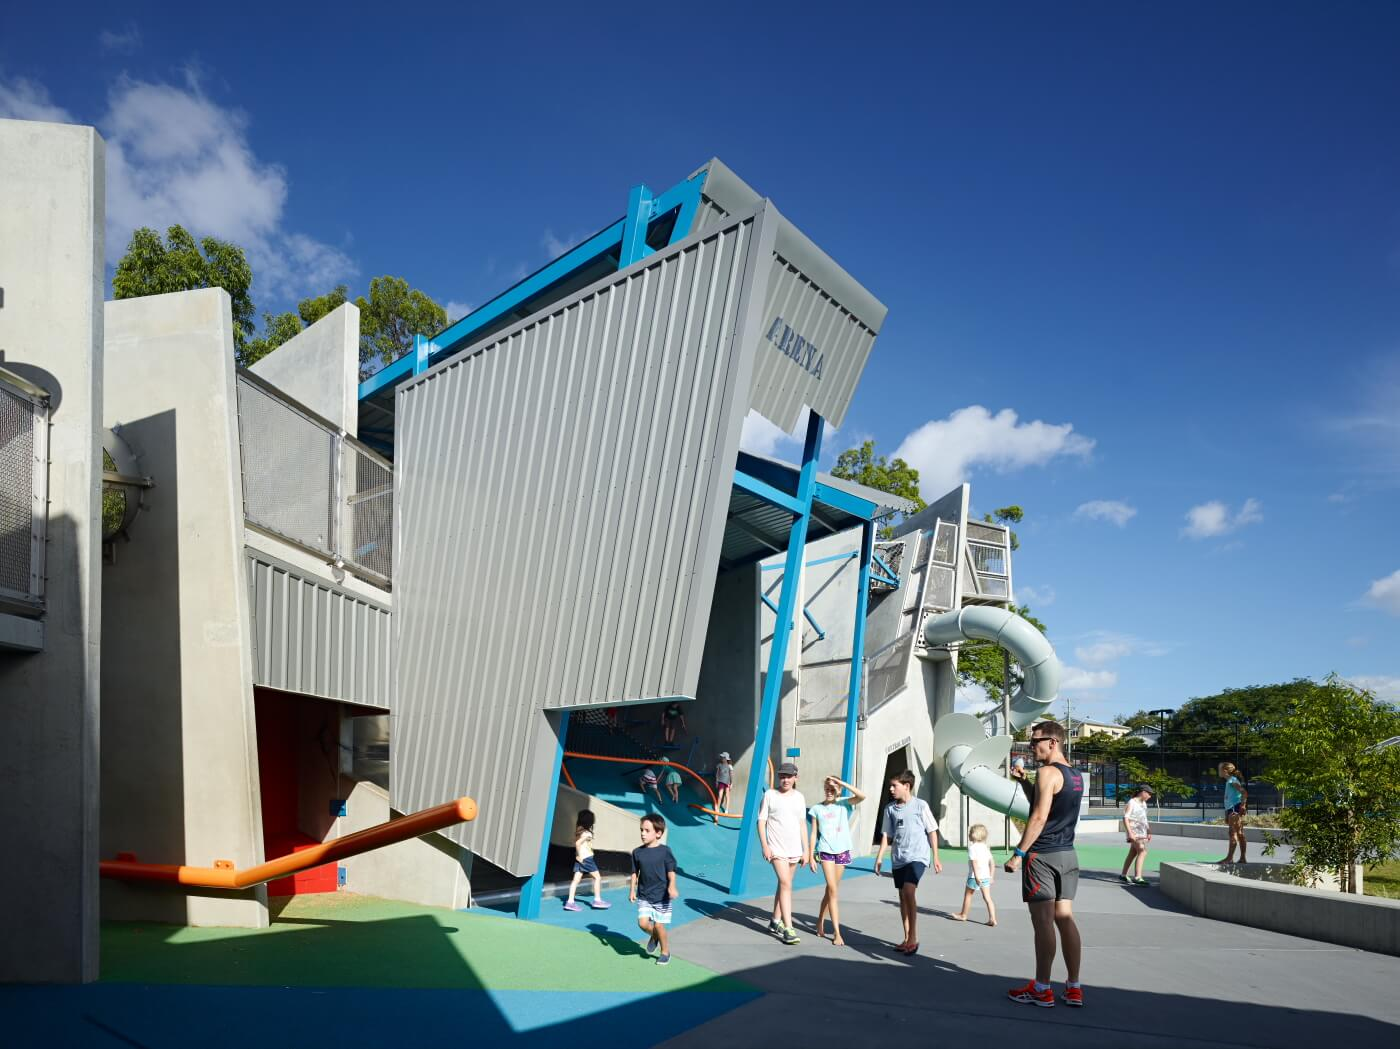 Frew-park-arena-playground-guymer-bailey-05.JPG